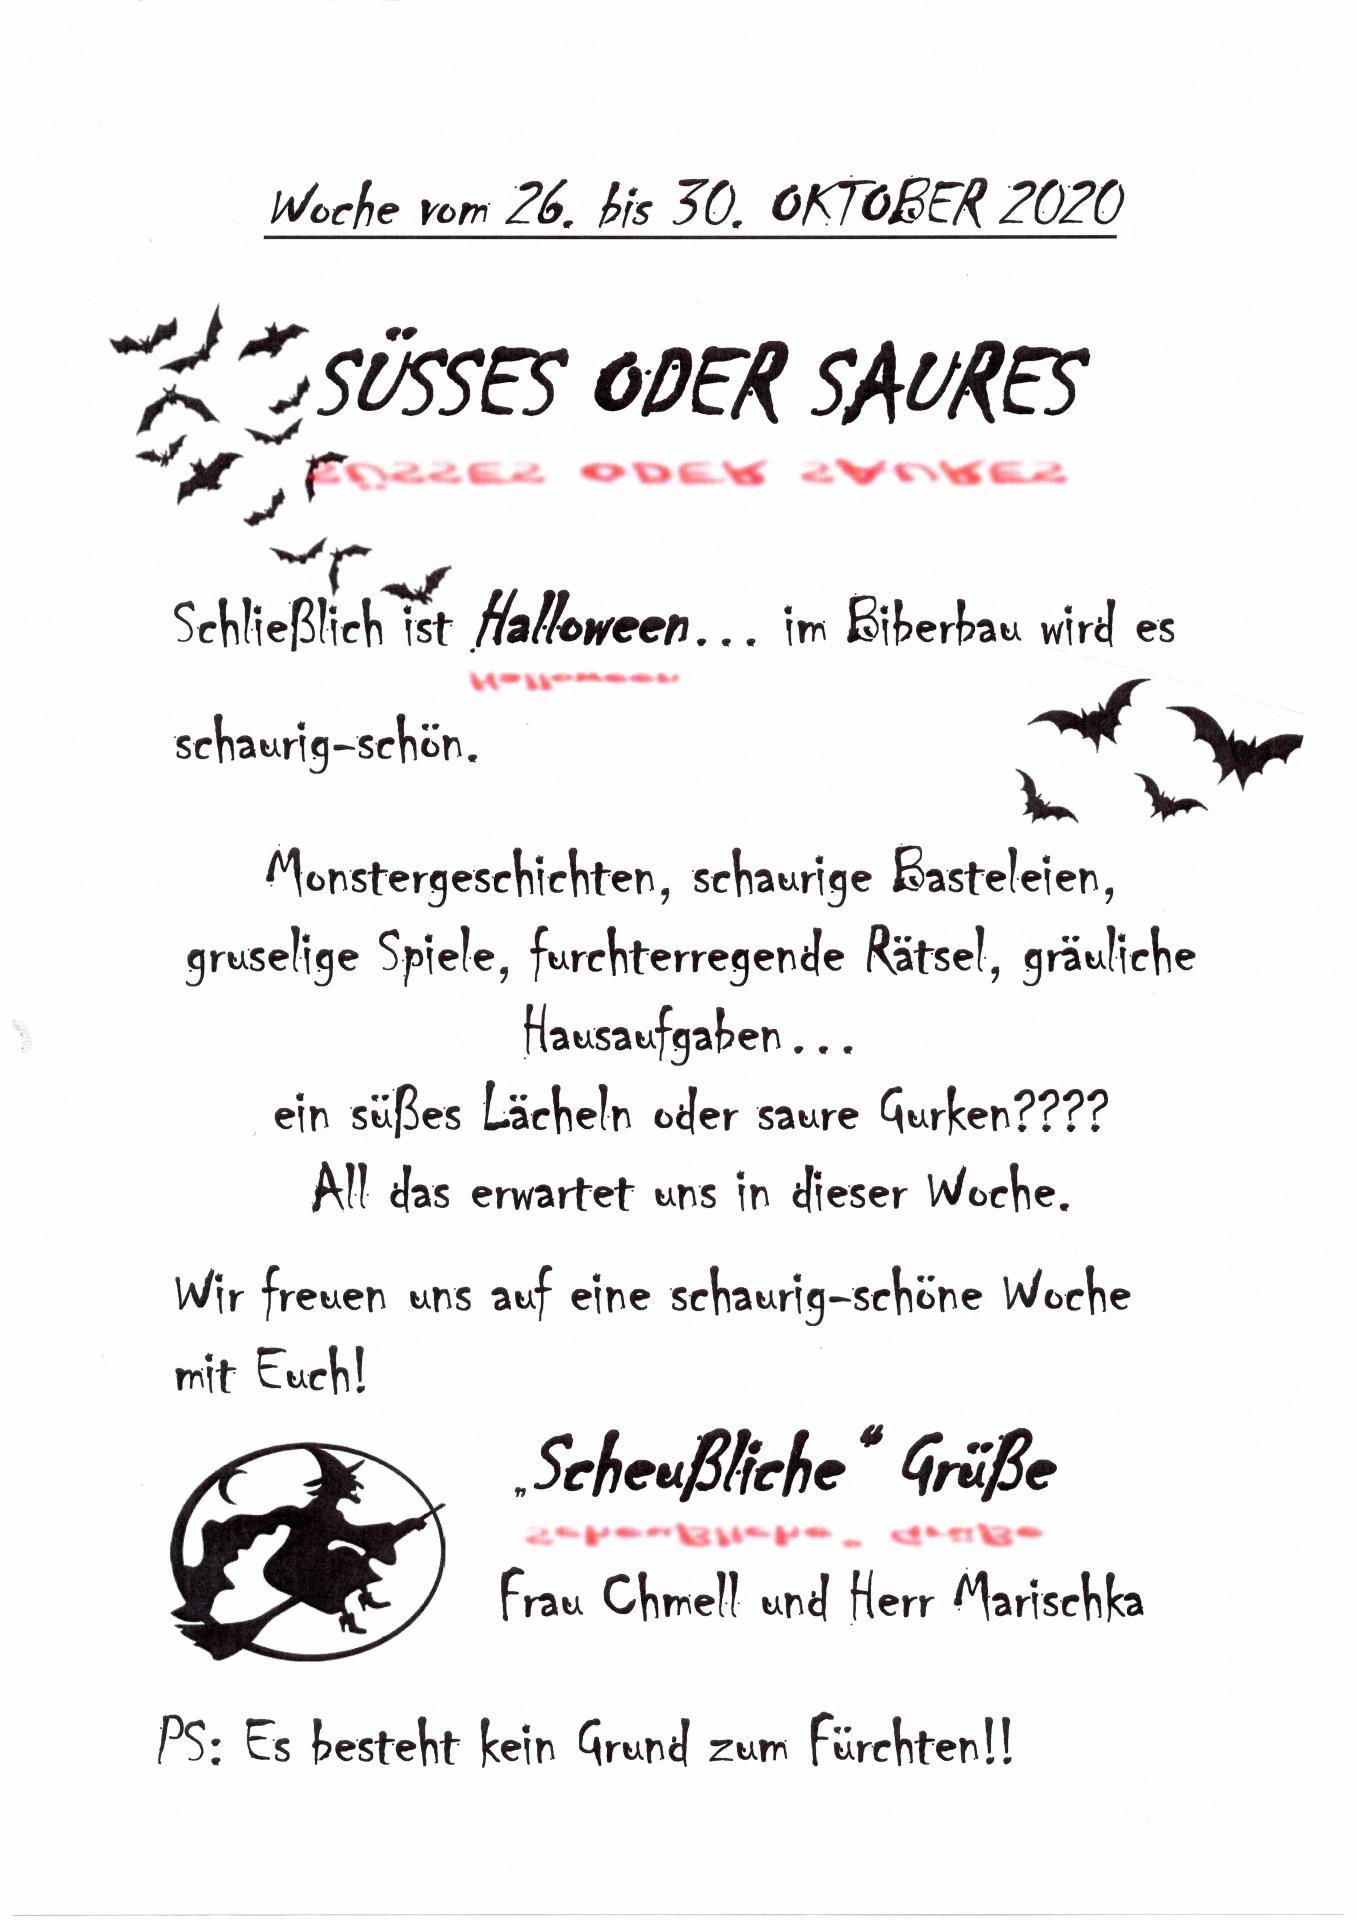 wocheplan Biber 26.10. - 30.10.